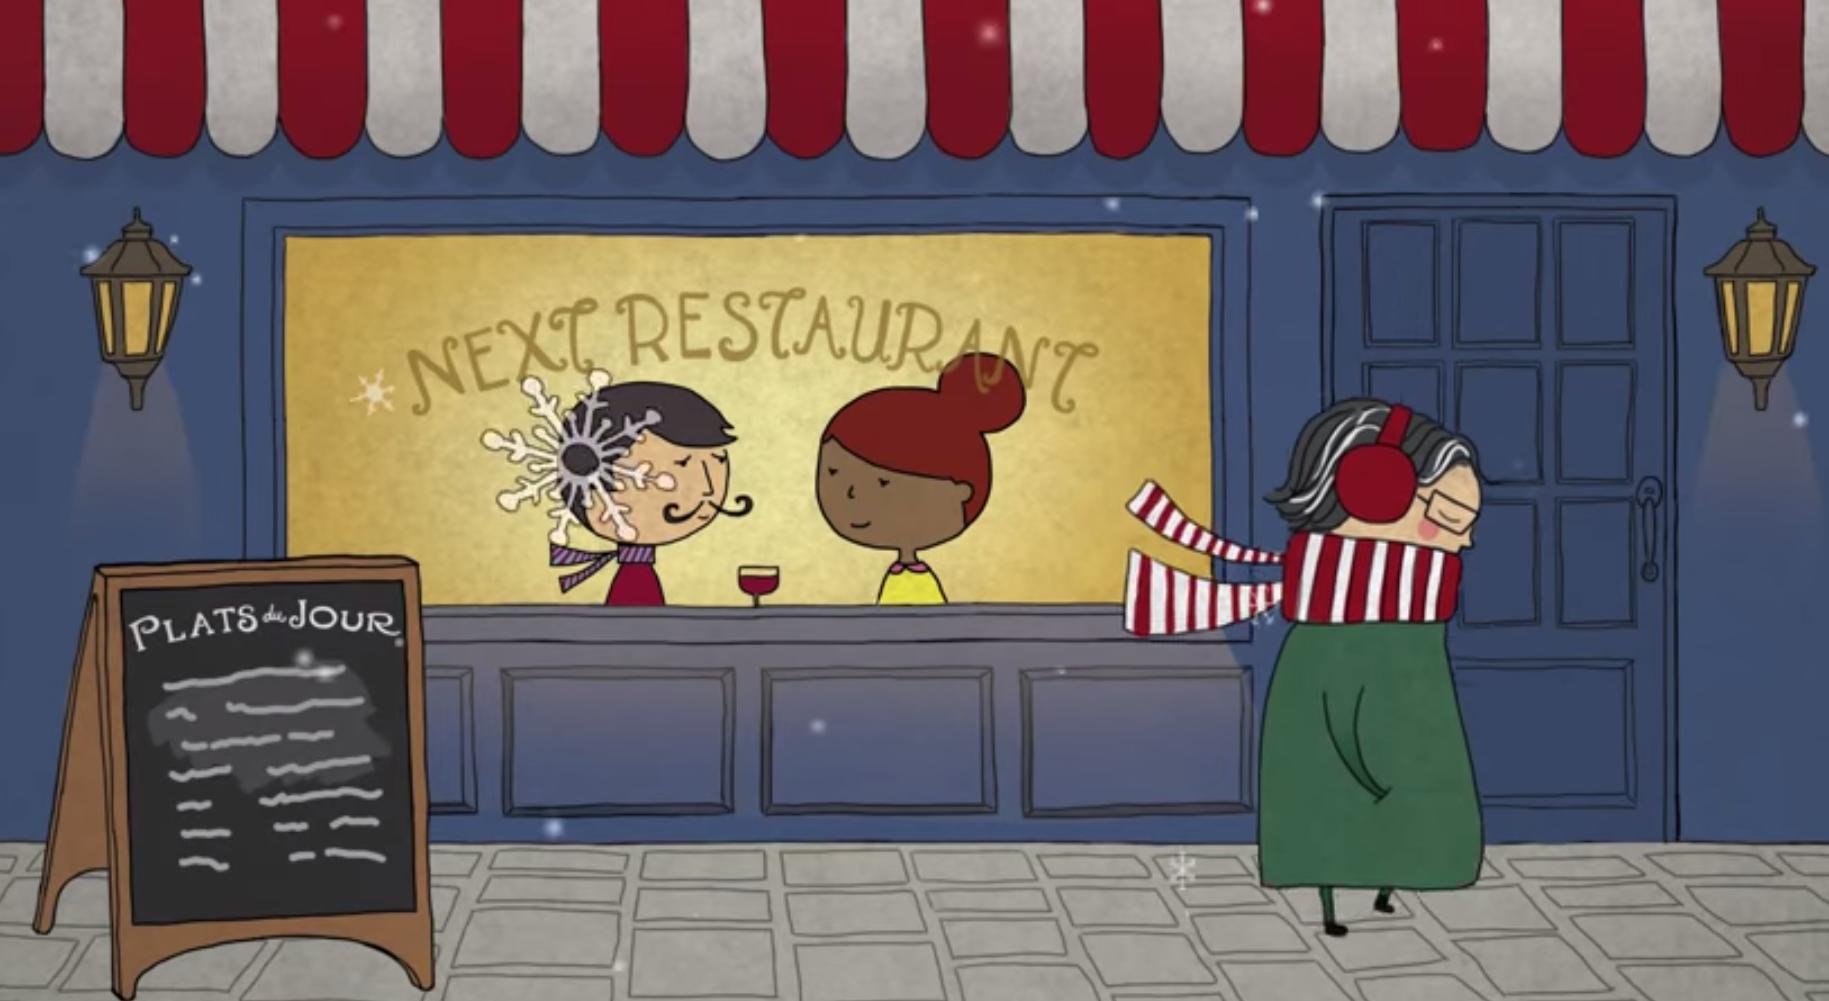 Screenshot from Next's new video promoting their new menu  | @NextRestaurant